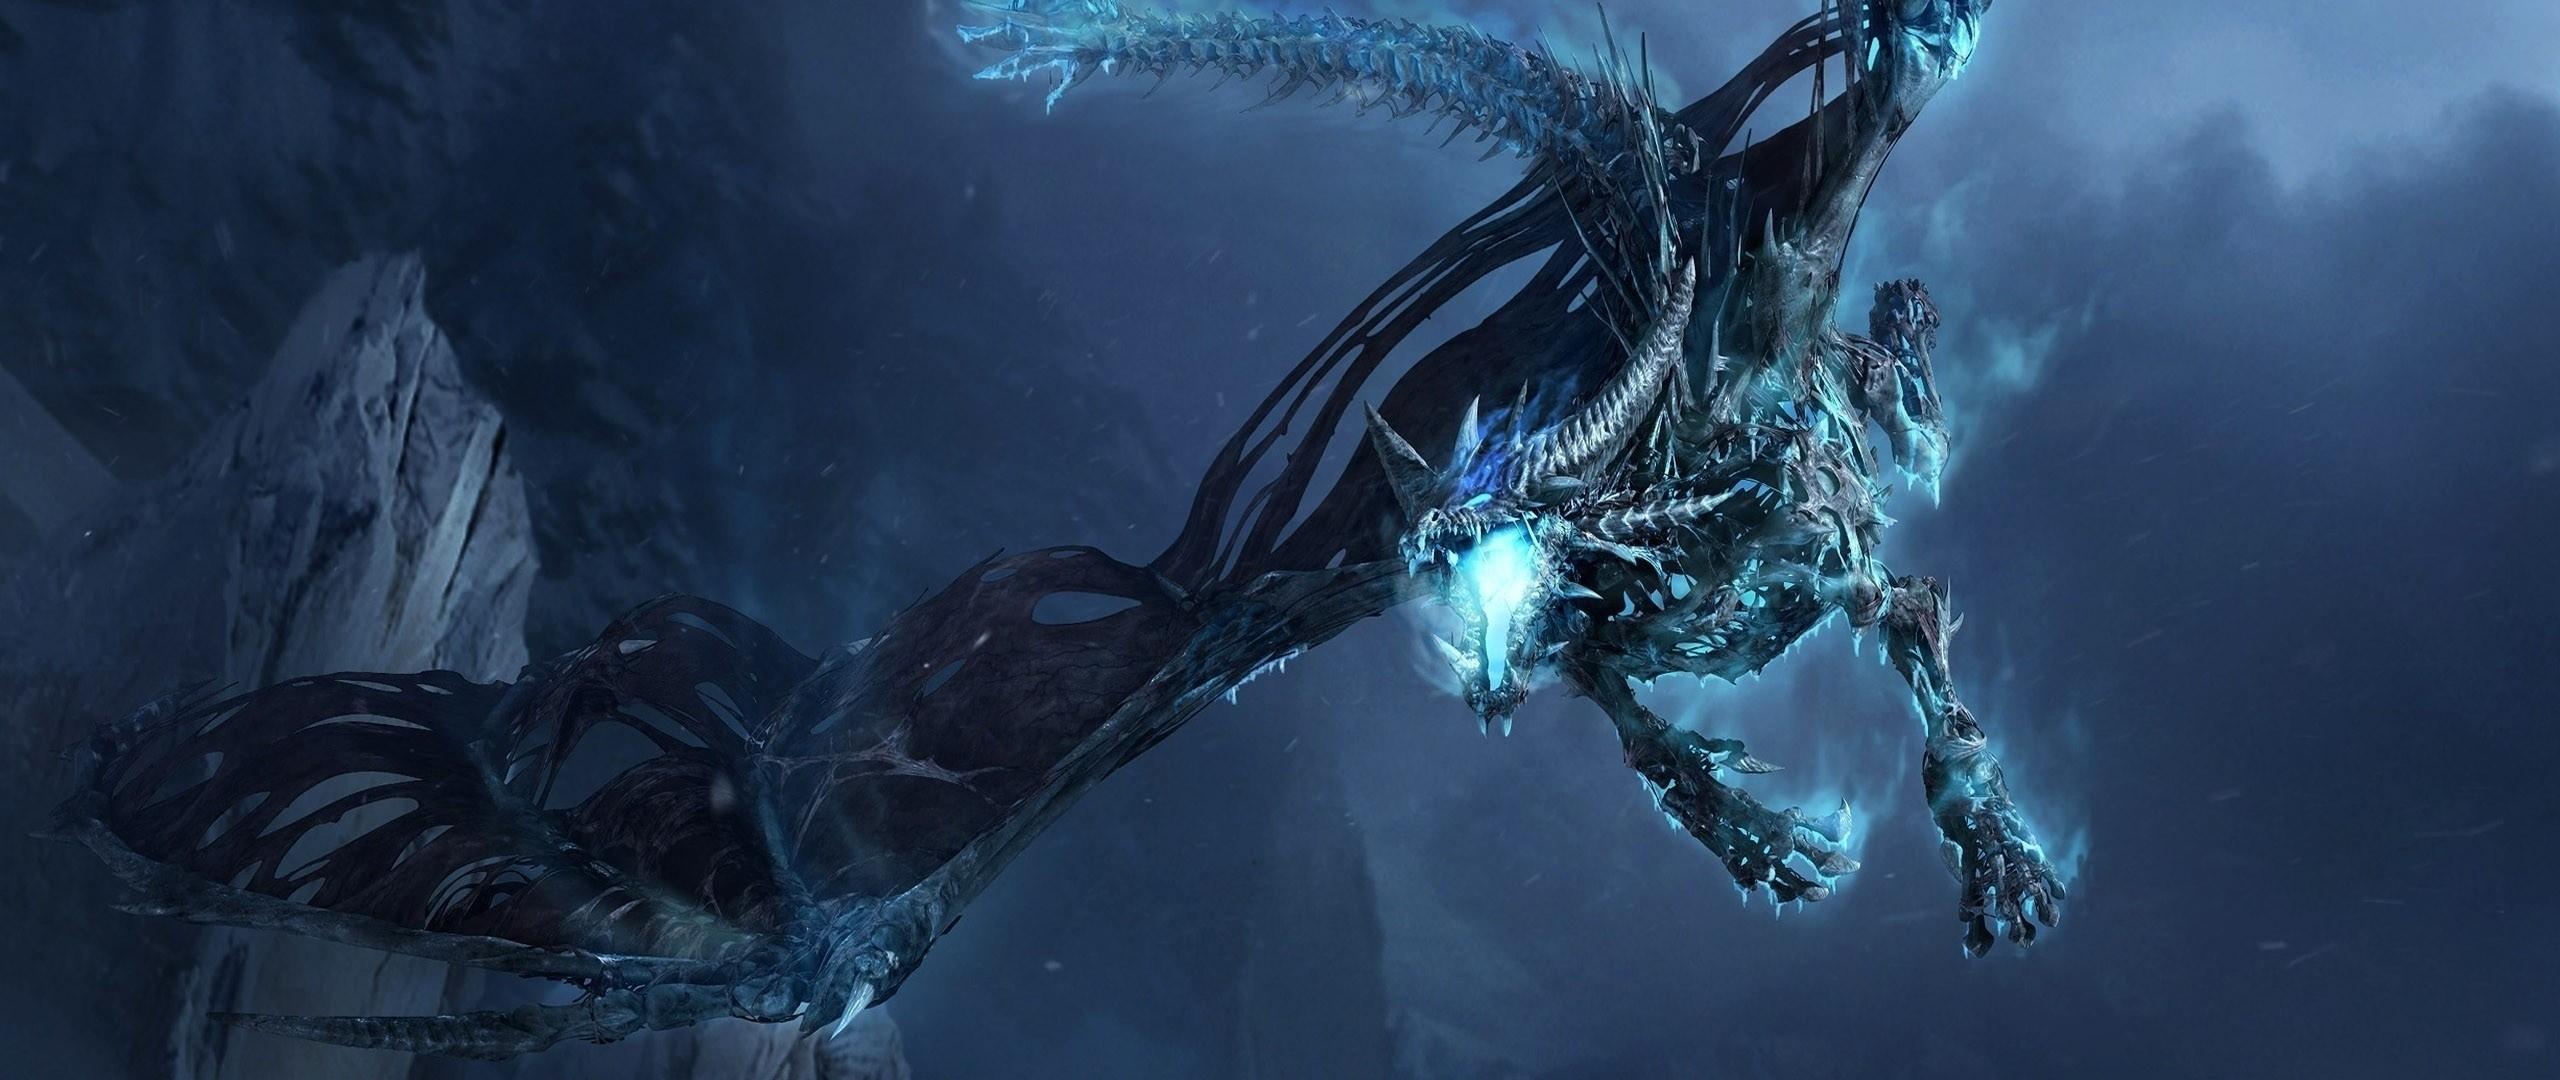 Halo 4 Unsc Wallpaper – WallDevil